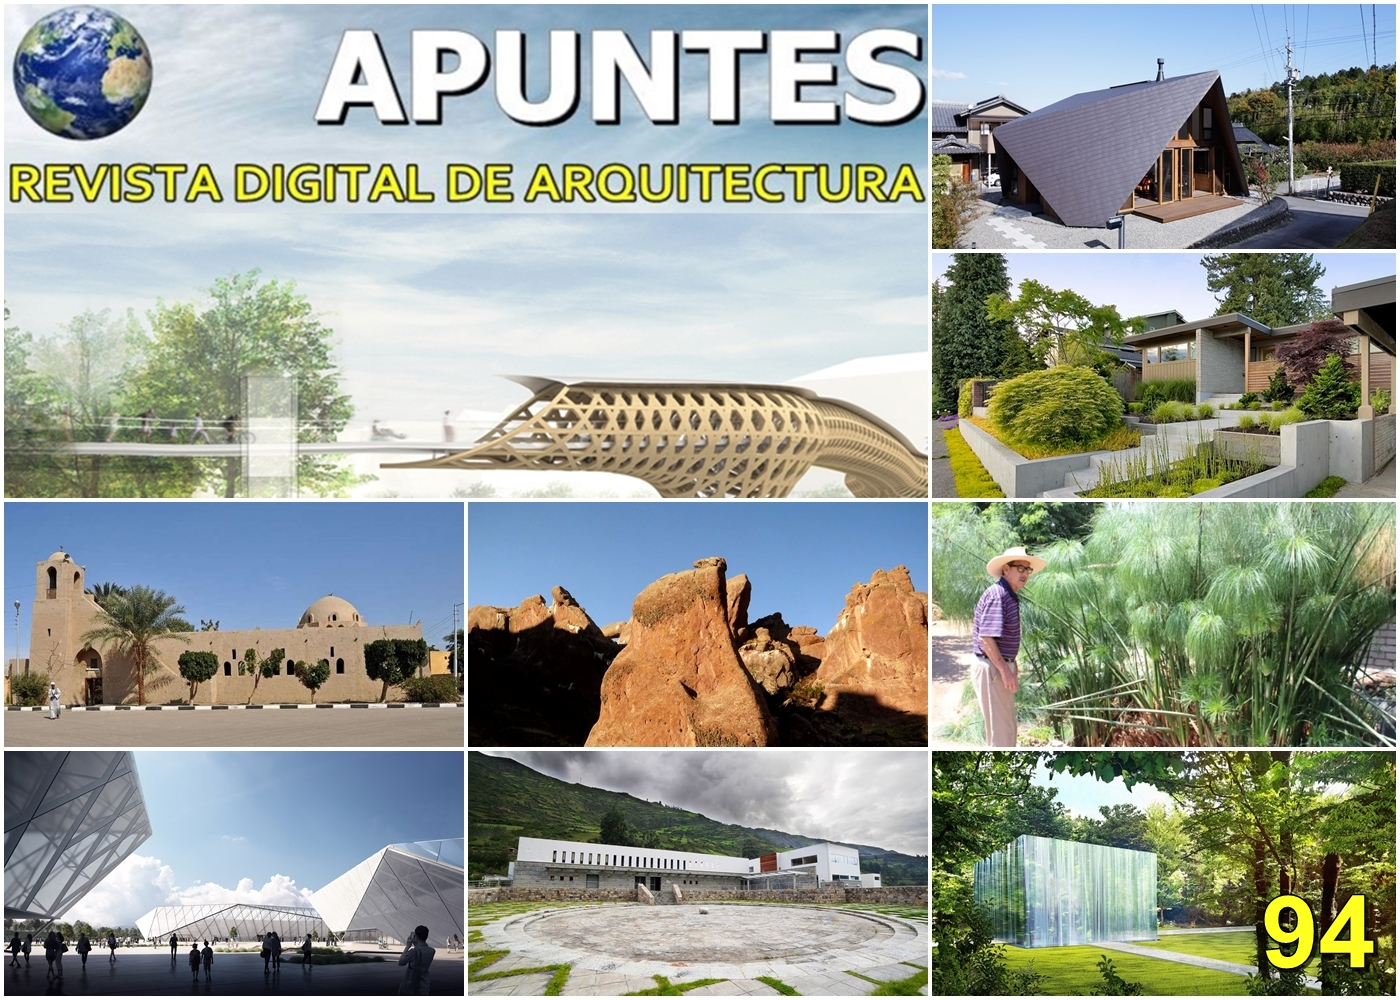 Revista Digital Apuntes De Arquitectura